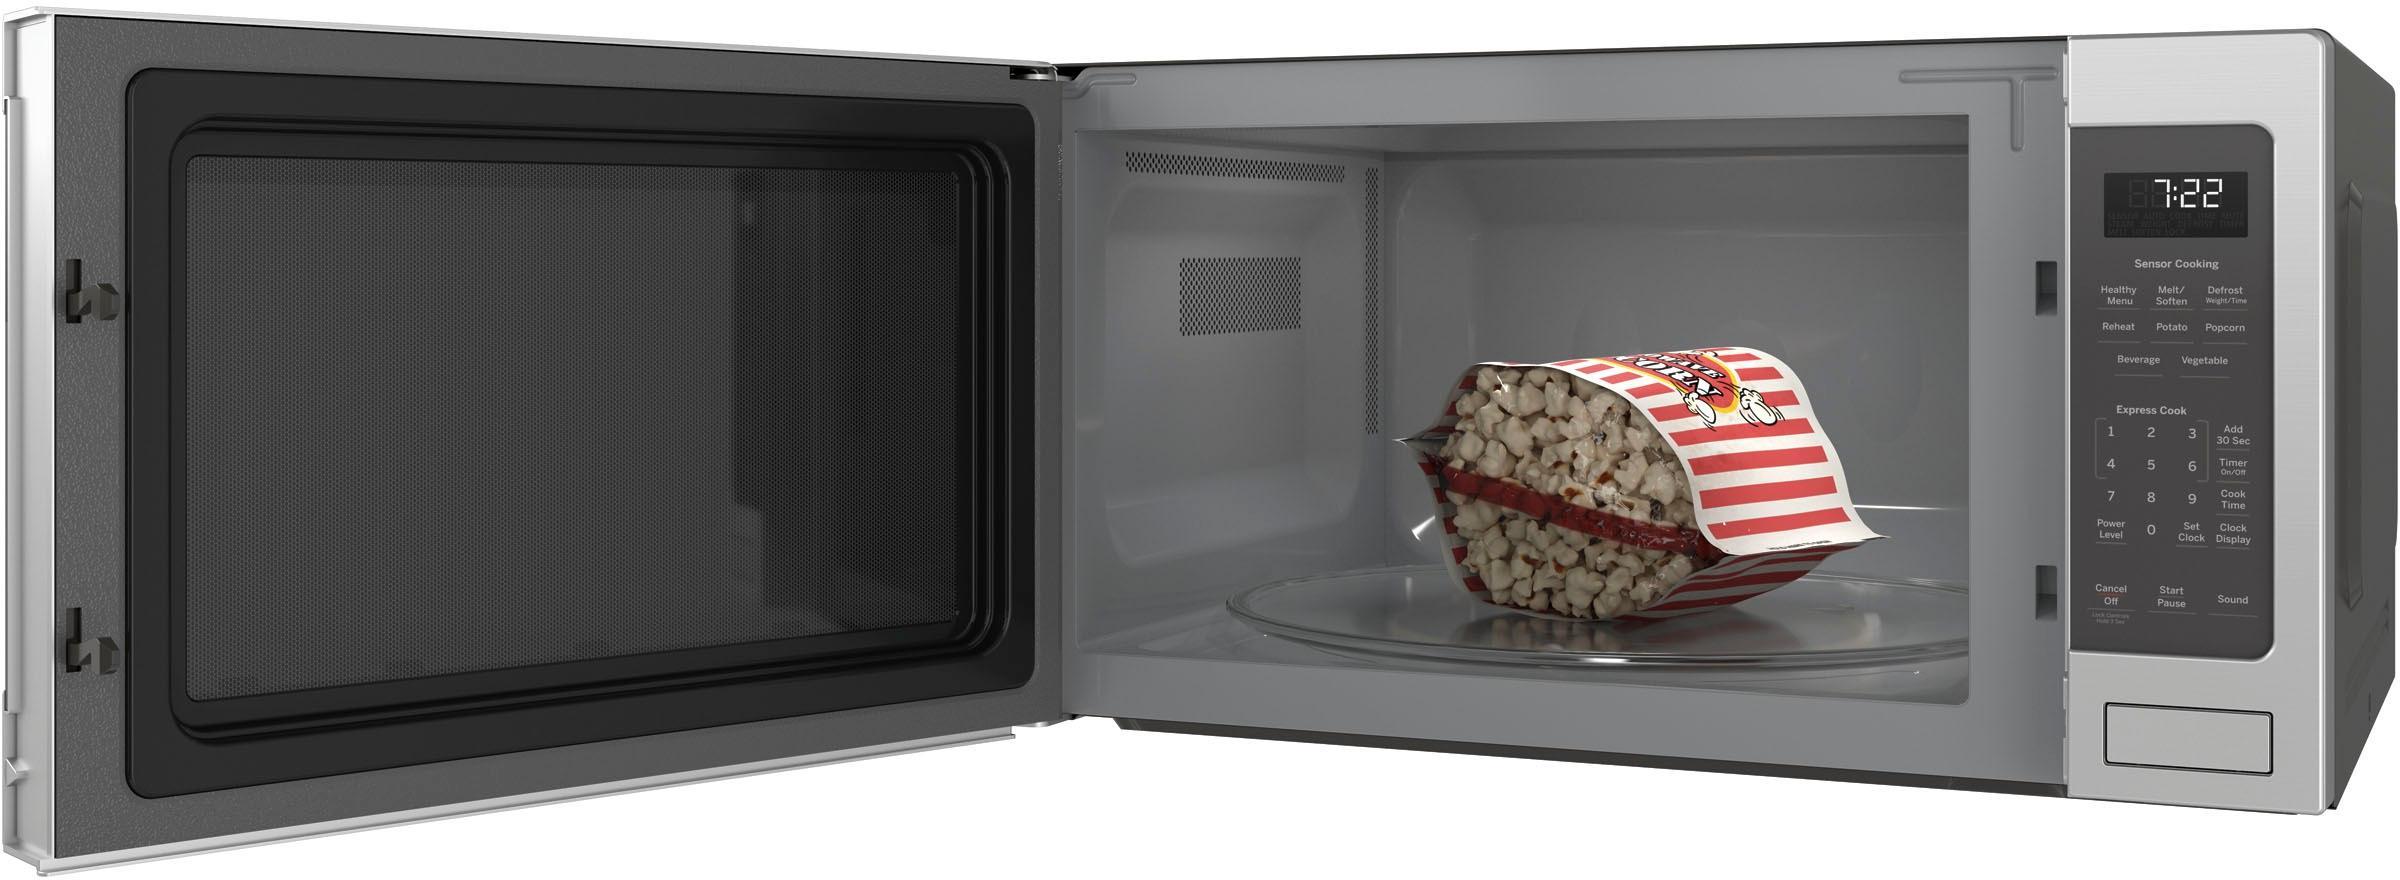 ge profile 2 2 cu ft microwave stainless steel